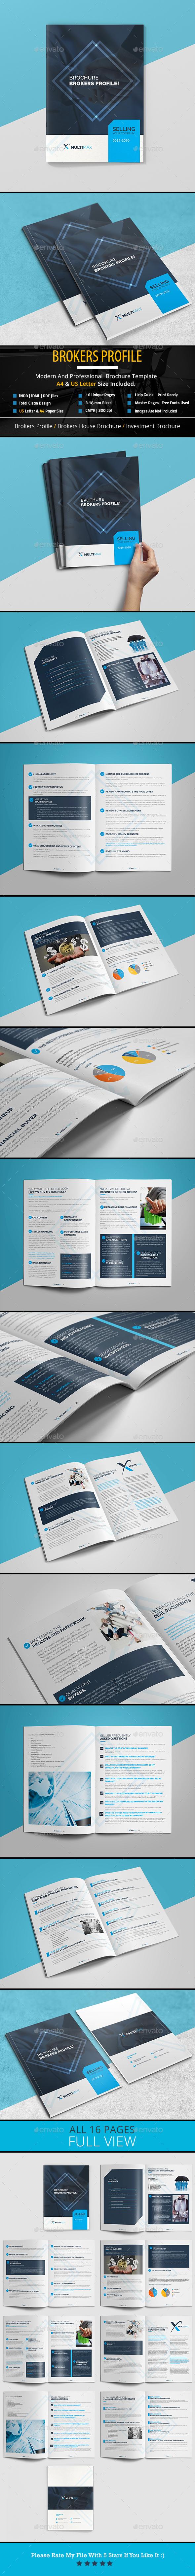 Brokers Profile Brochure - Brochures Print Templates